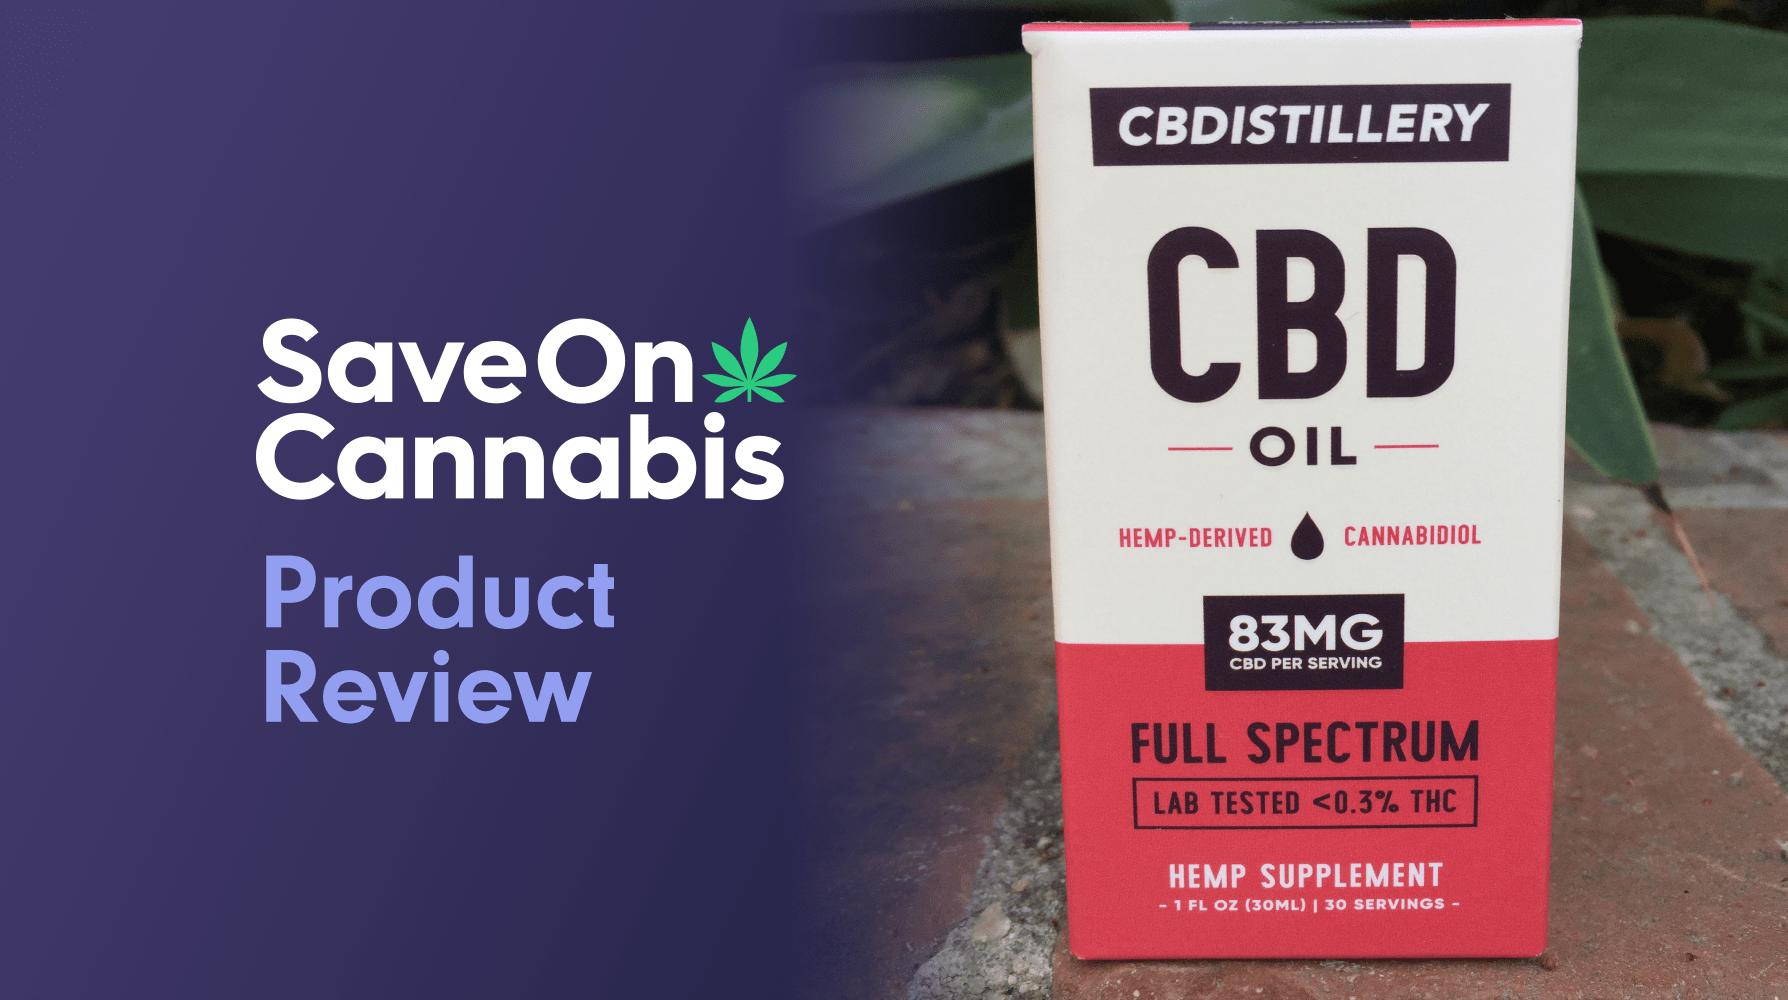 cbdistillery full spectrum cbd oil tincture 2500 mg save on cannabis website